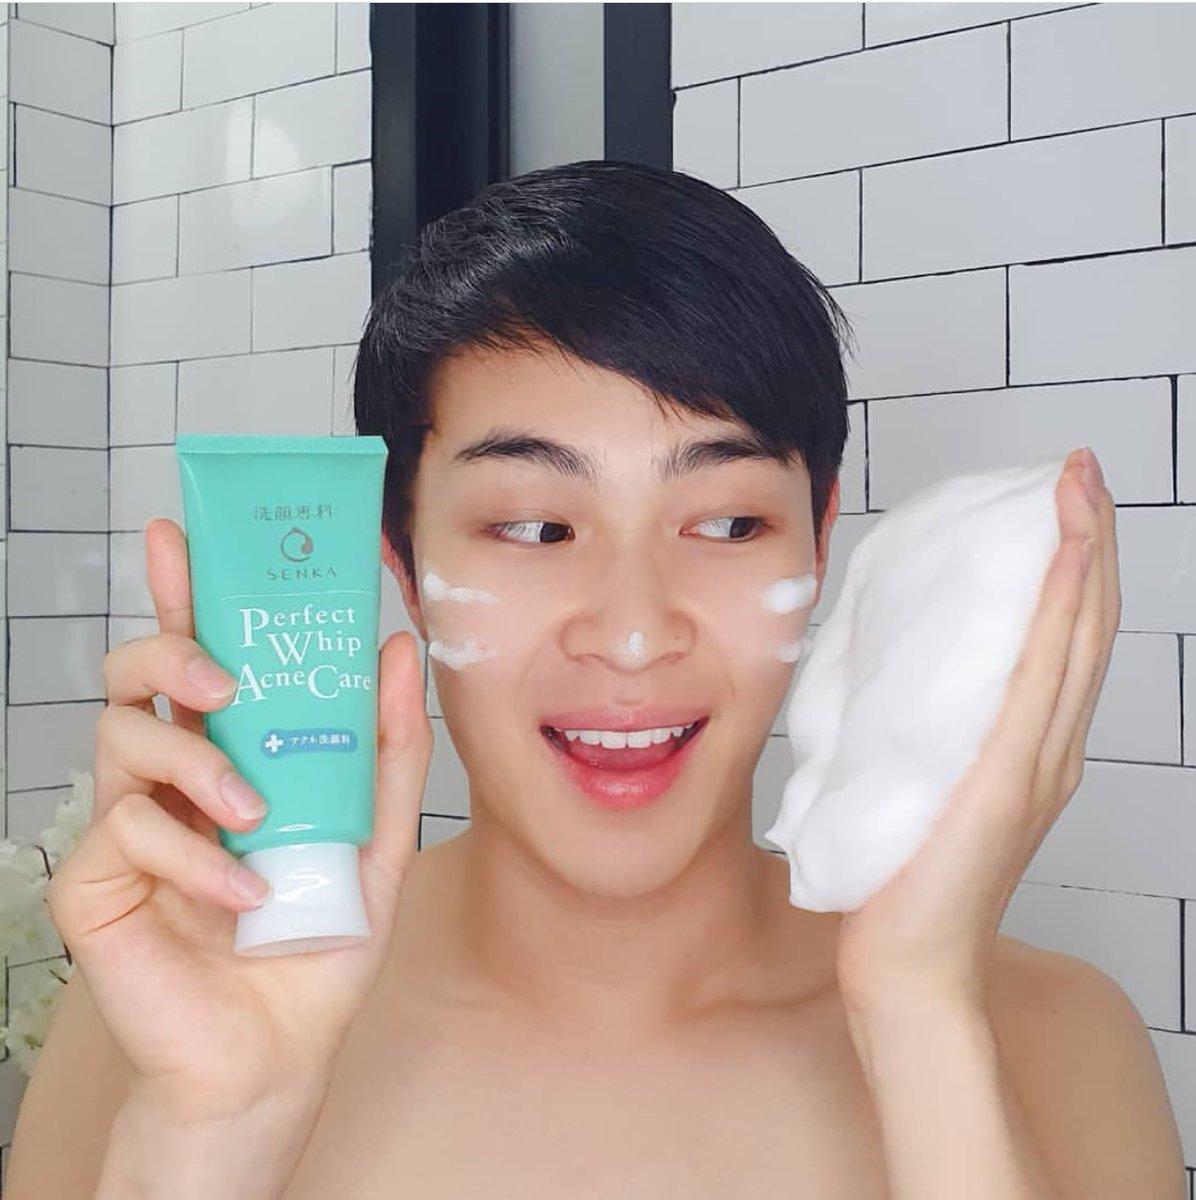 "Kết quả hình ảnh cho Sữa rửa mặt cho da mụn Senka Perfect Whip Acne Care 100g"""